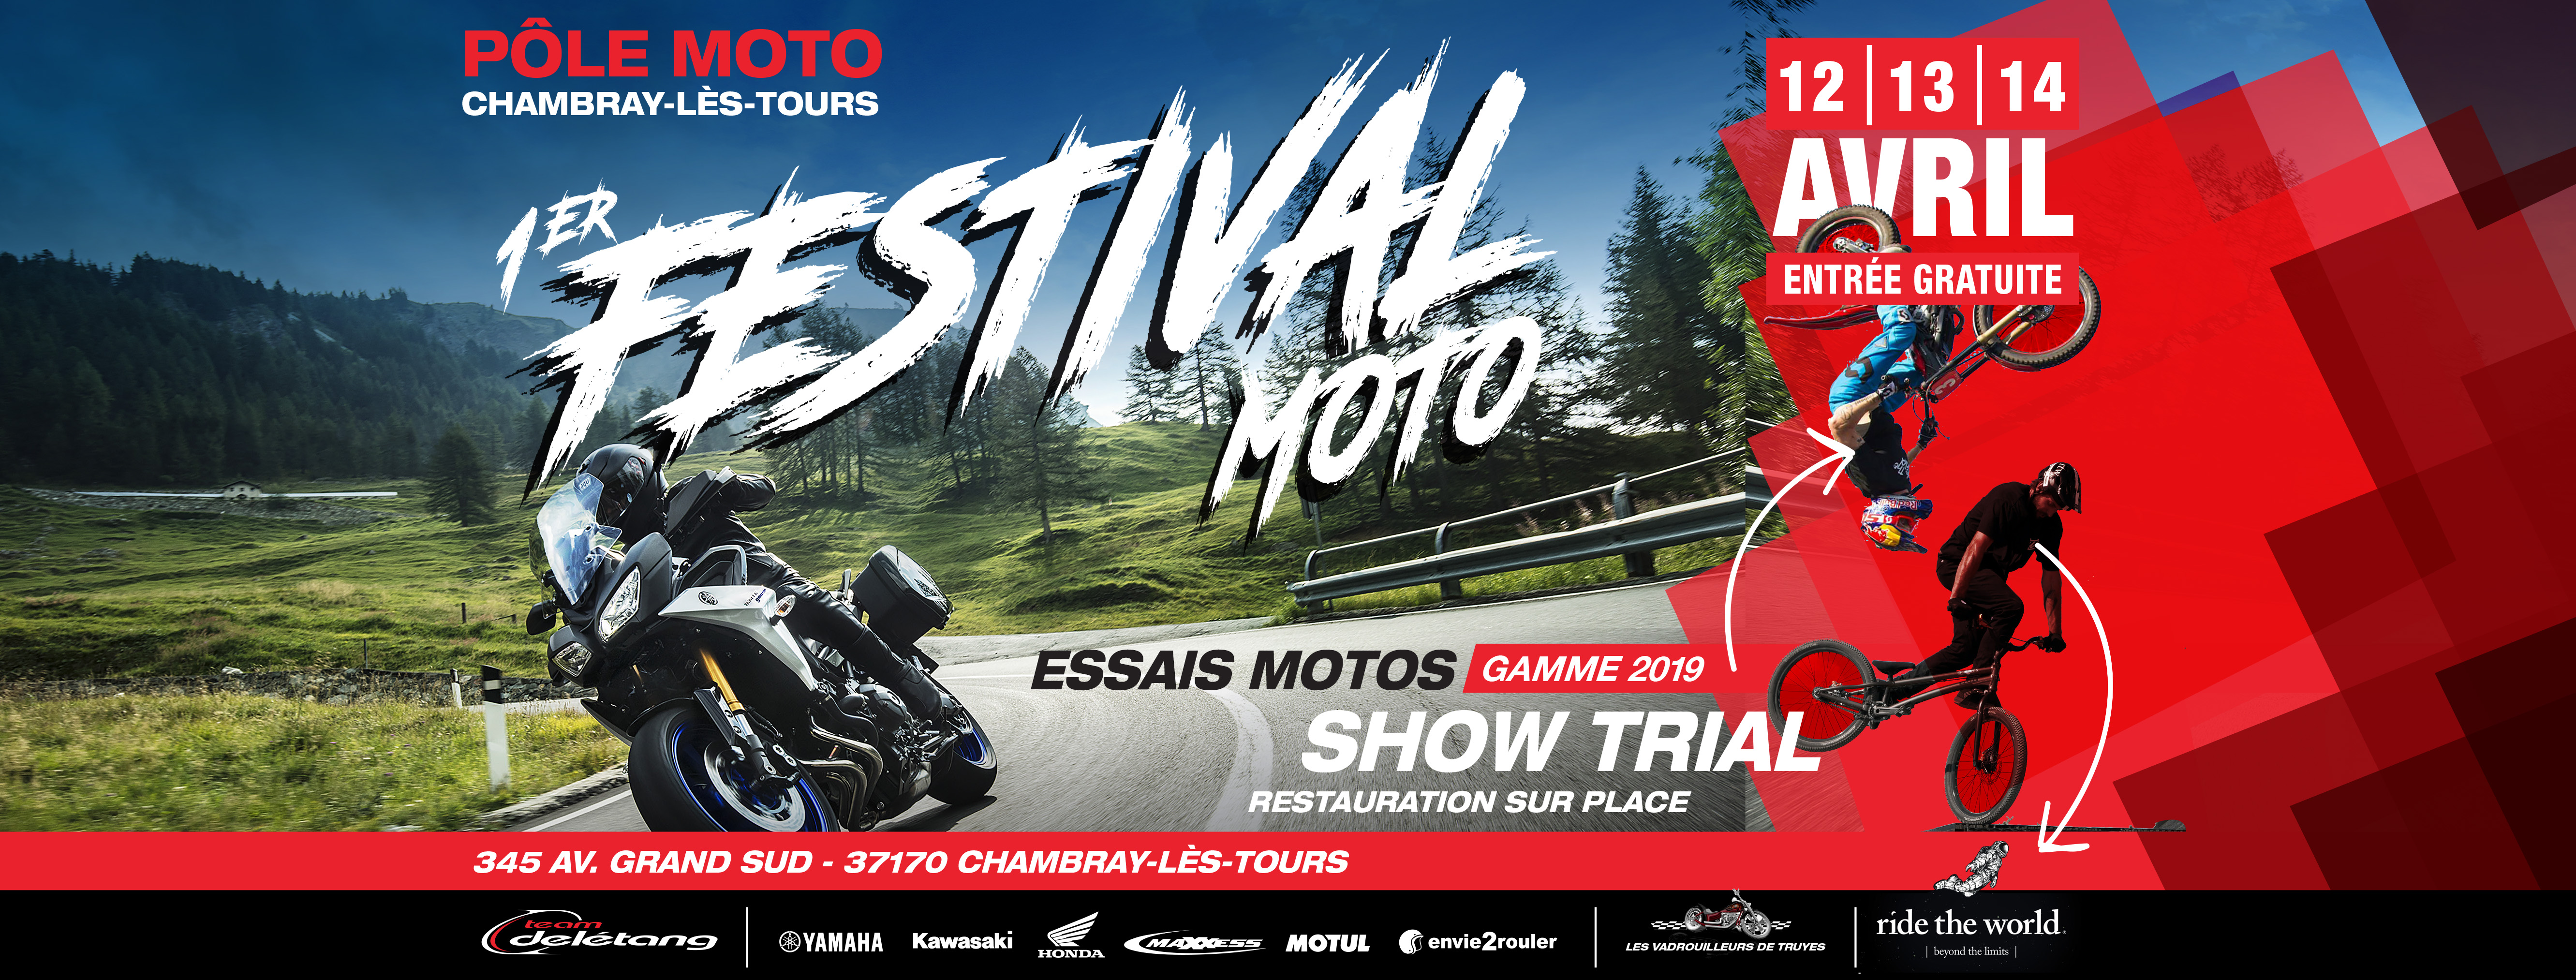 Essais Motos, Show Trial, Restauration, Pôle Moto à Chambray-lès-Tours